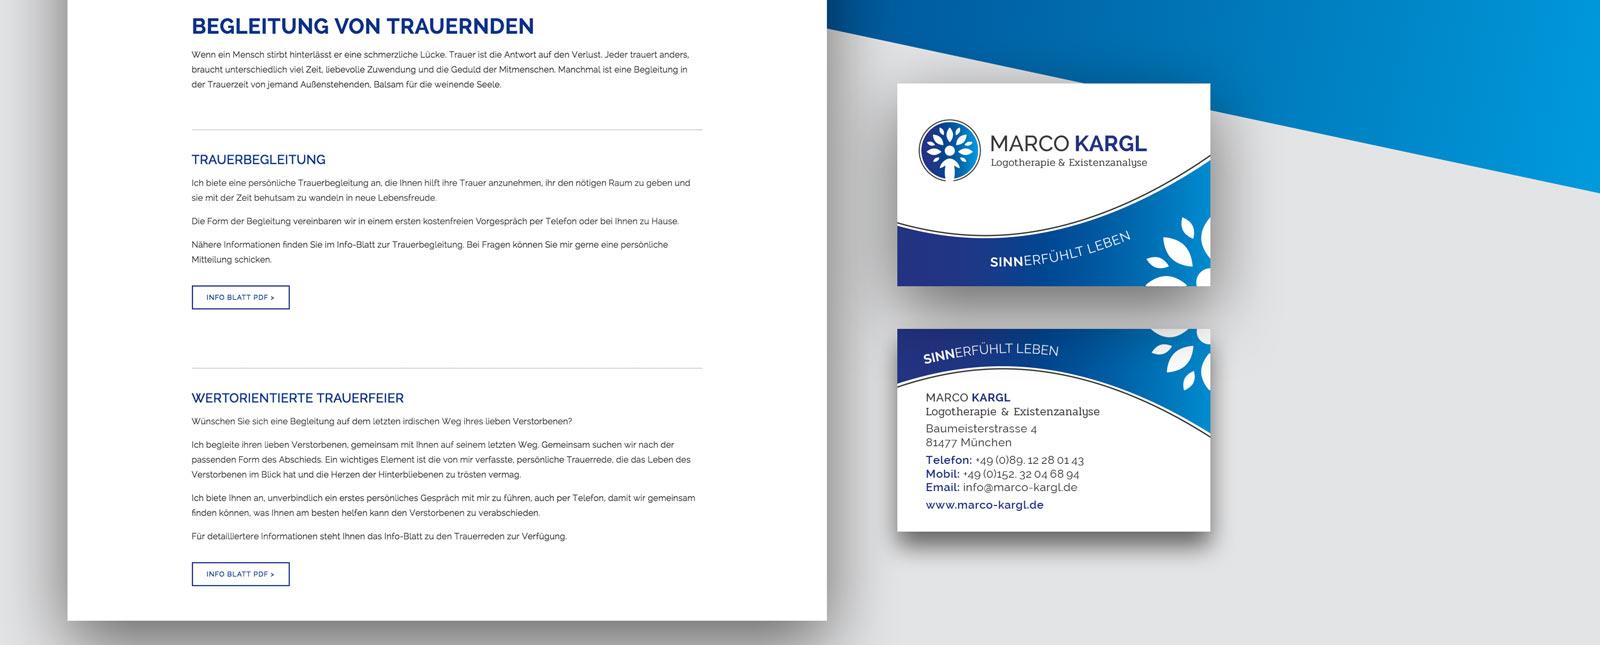 Marco_Kargl_Visitenkarten_Gestaltung_8.jpg